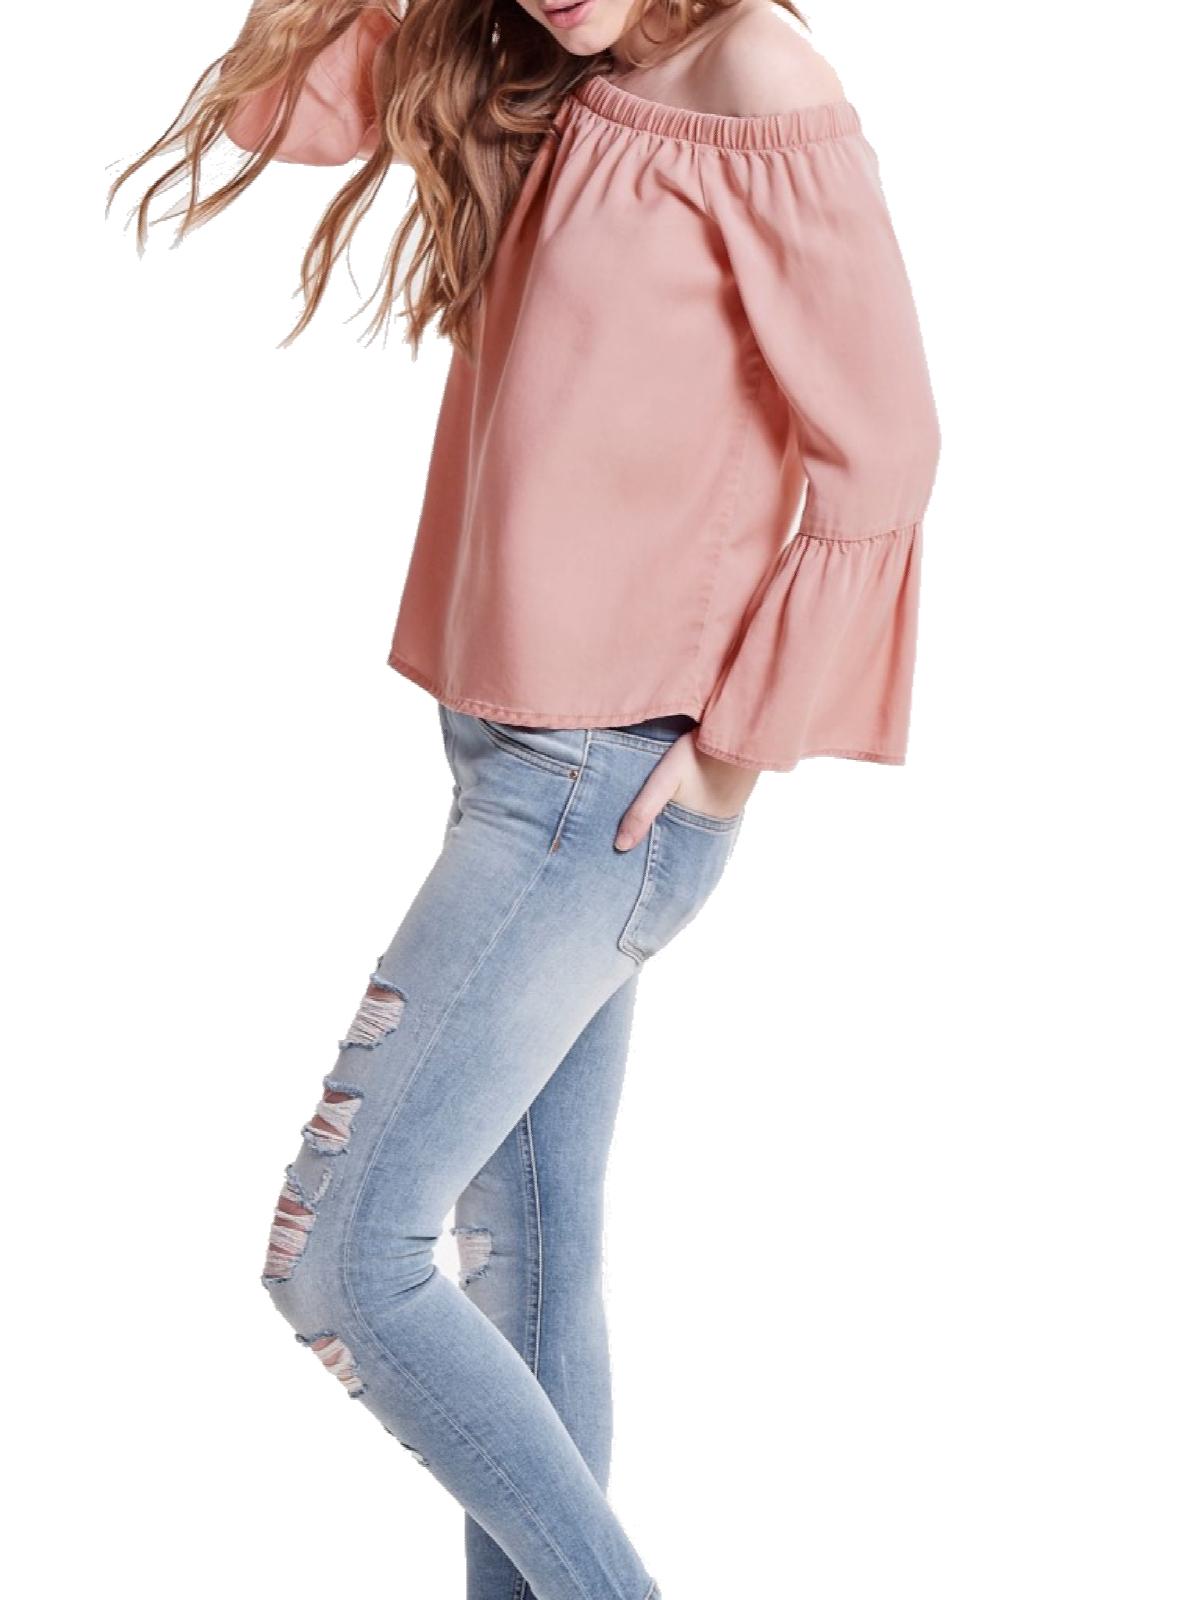 ONLY Damen Bluse Shirt Oberteil T-Shirt Off Shoulder Top trägerlos schulter-frei